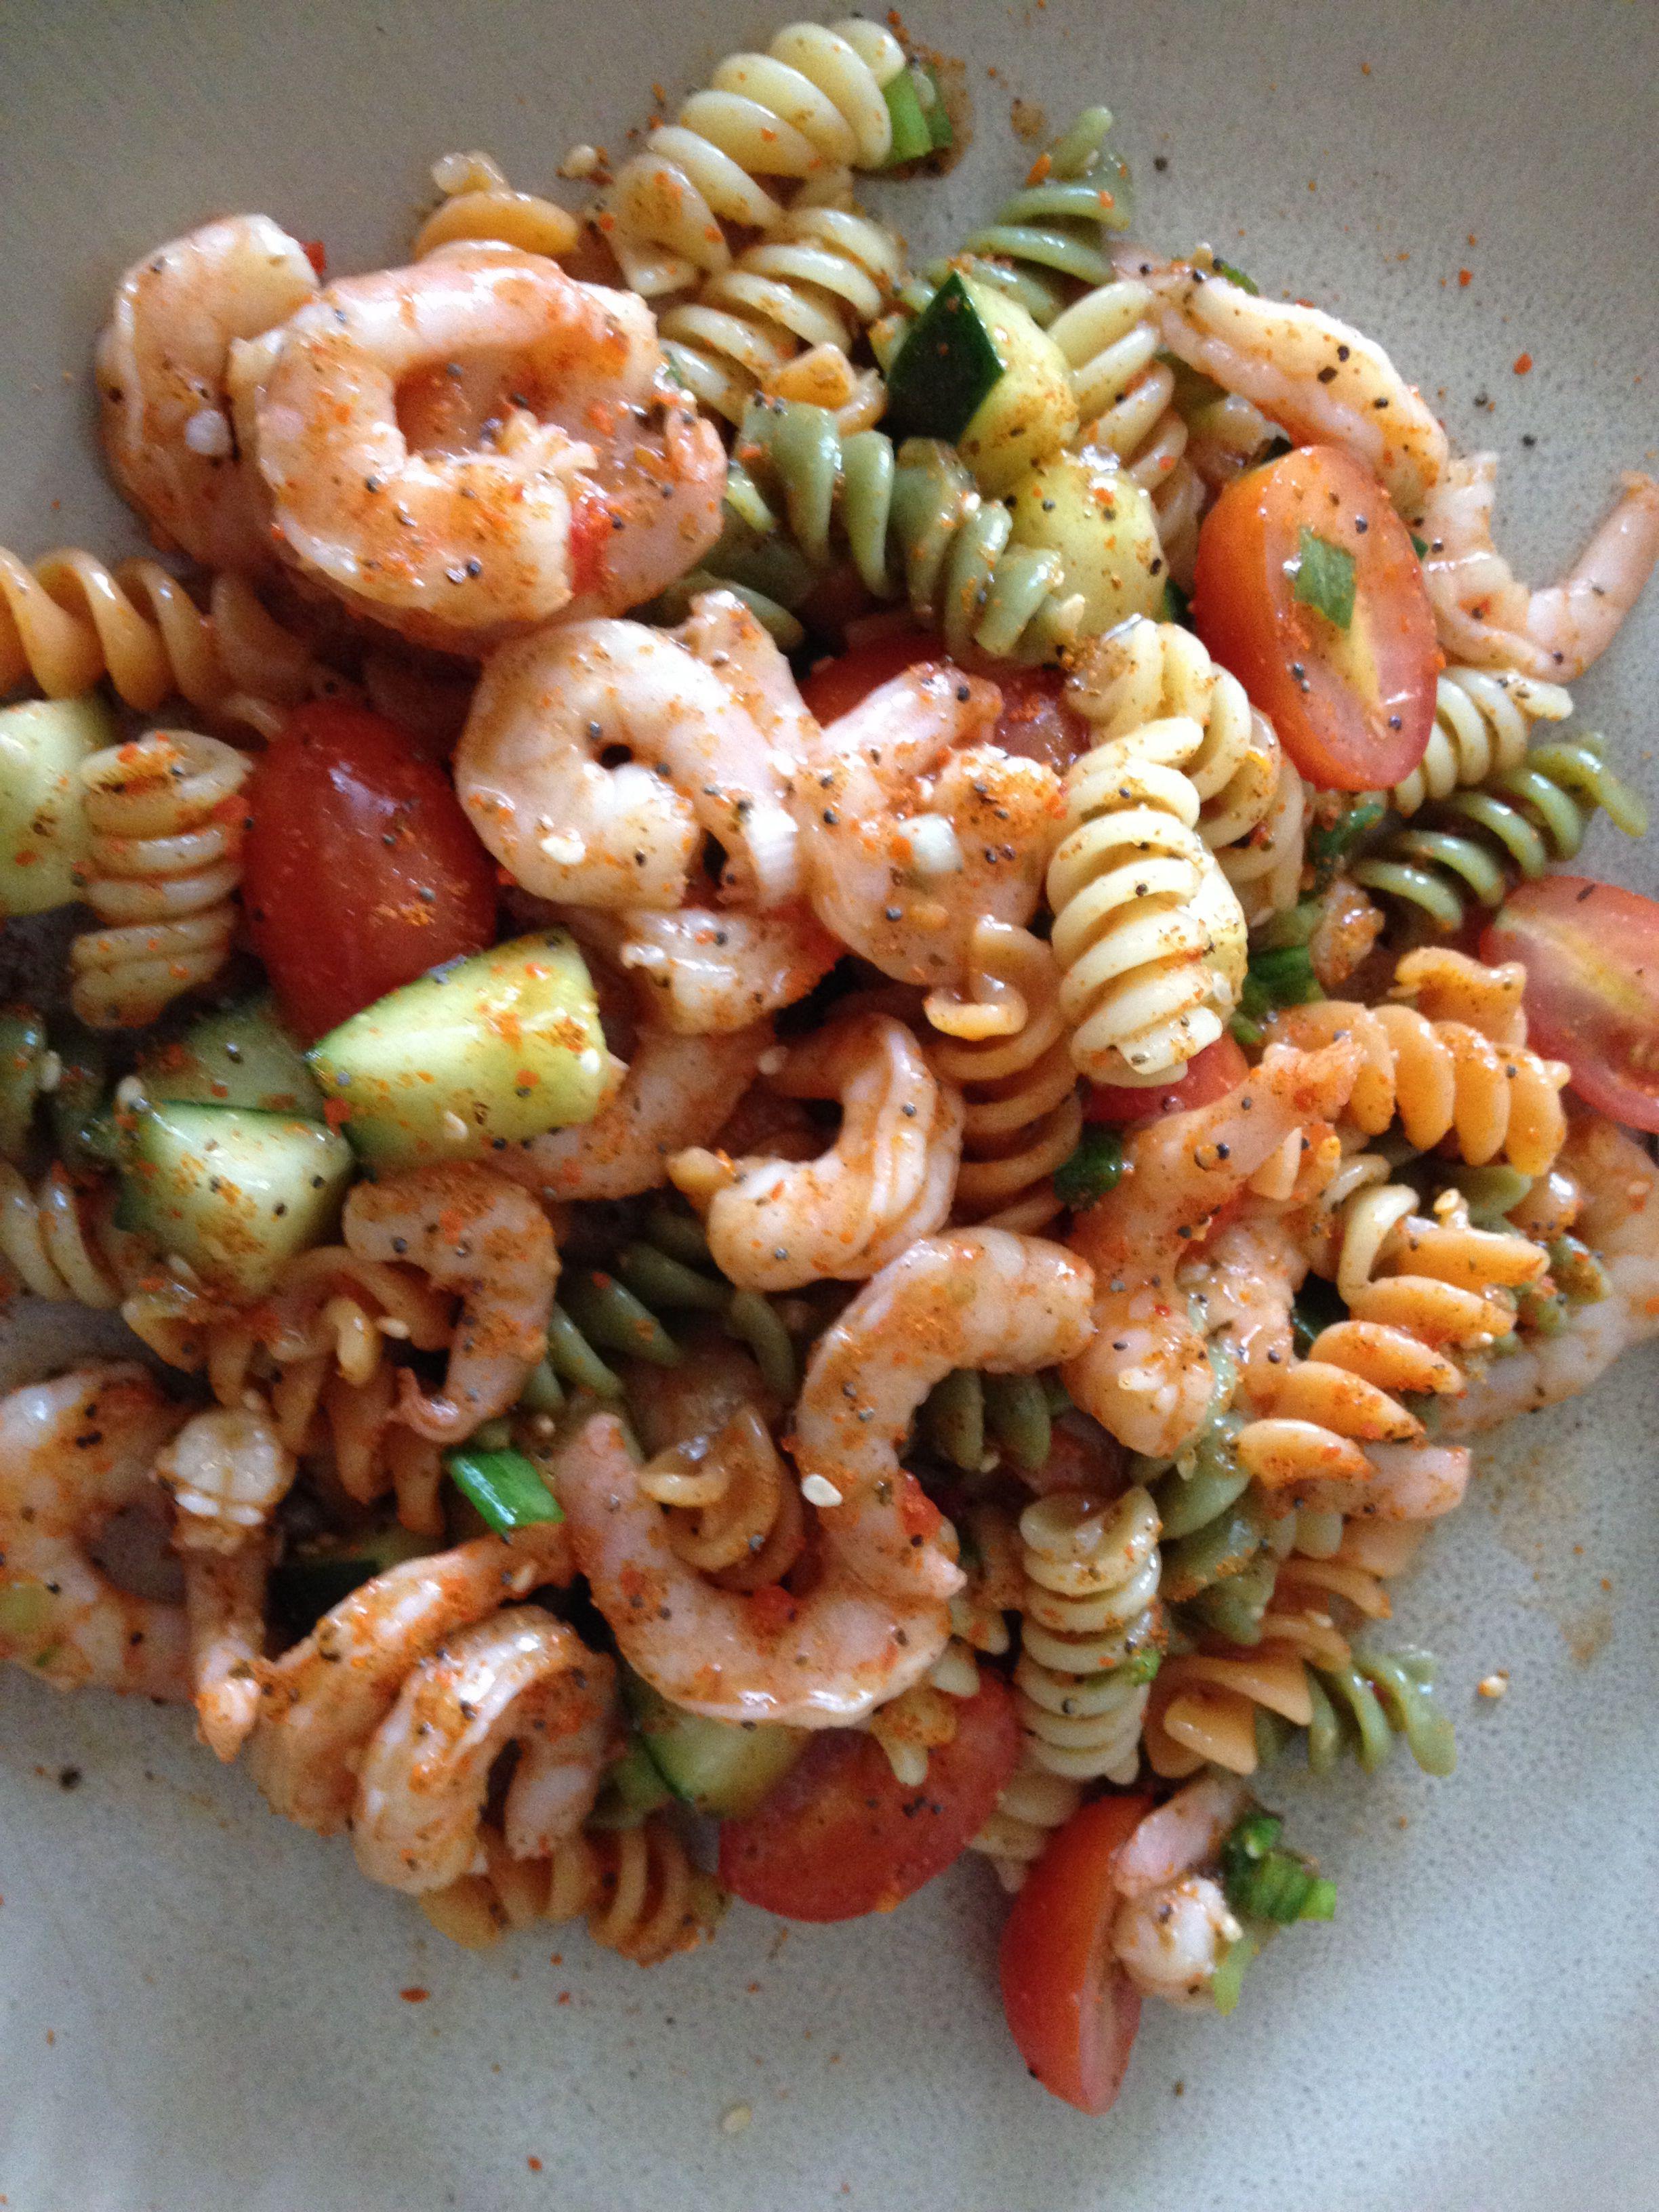 Pasta Salad With Shrimp Grape Tomatoes Cucumber Scallions Salad Supreme Seasoning And Bell Sea Food Salad Recipes Seafood Salad Pasta Pasta Salad Italian